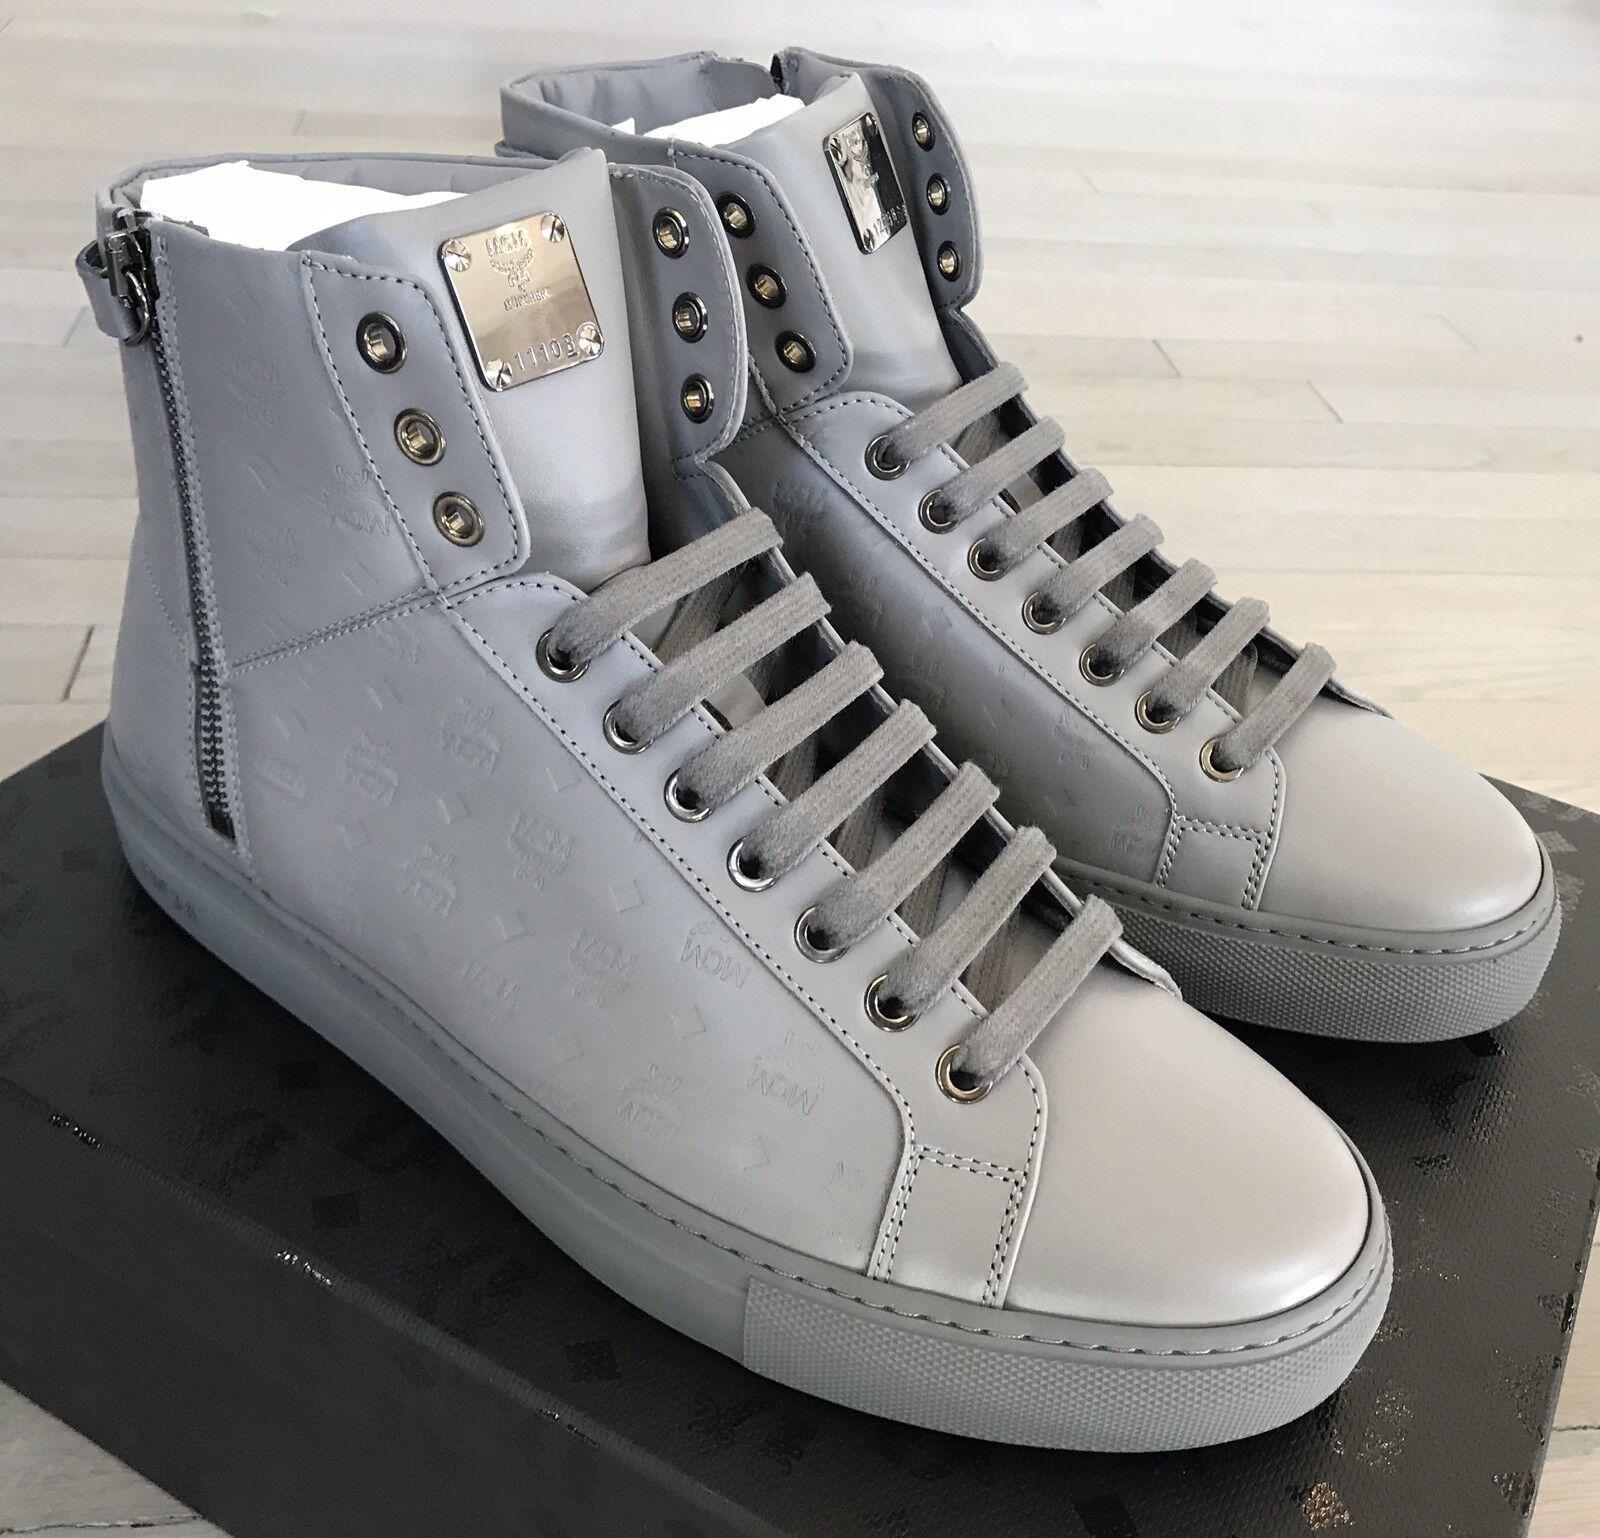 600  MCM Light Grigio High Tops Leather Scarpe da Ginnastica size US 10 Made in Italy